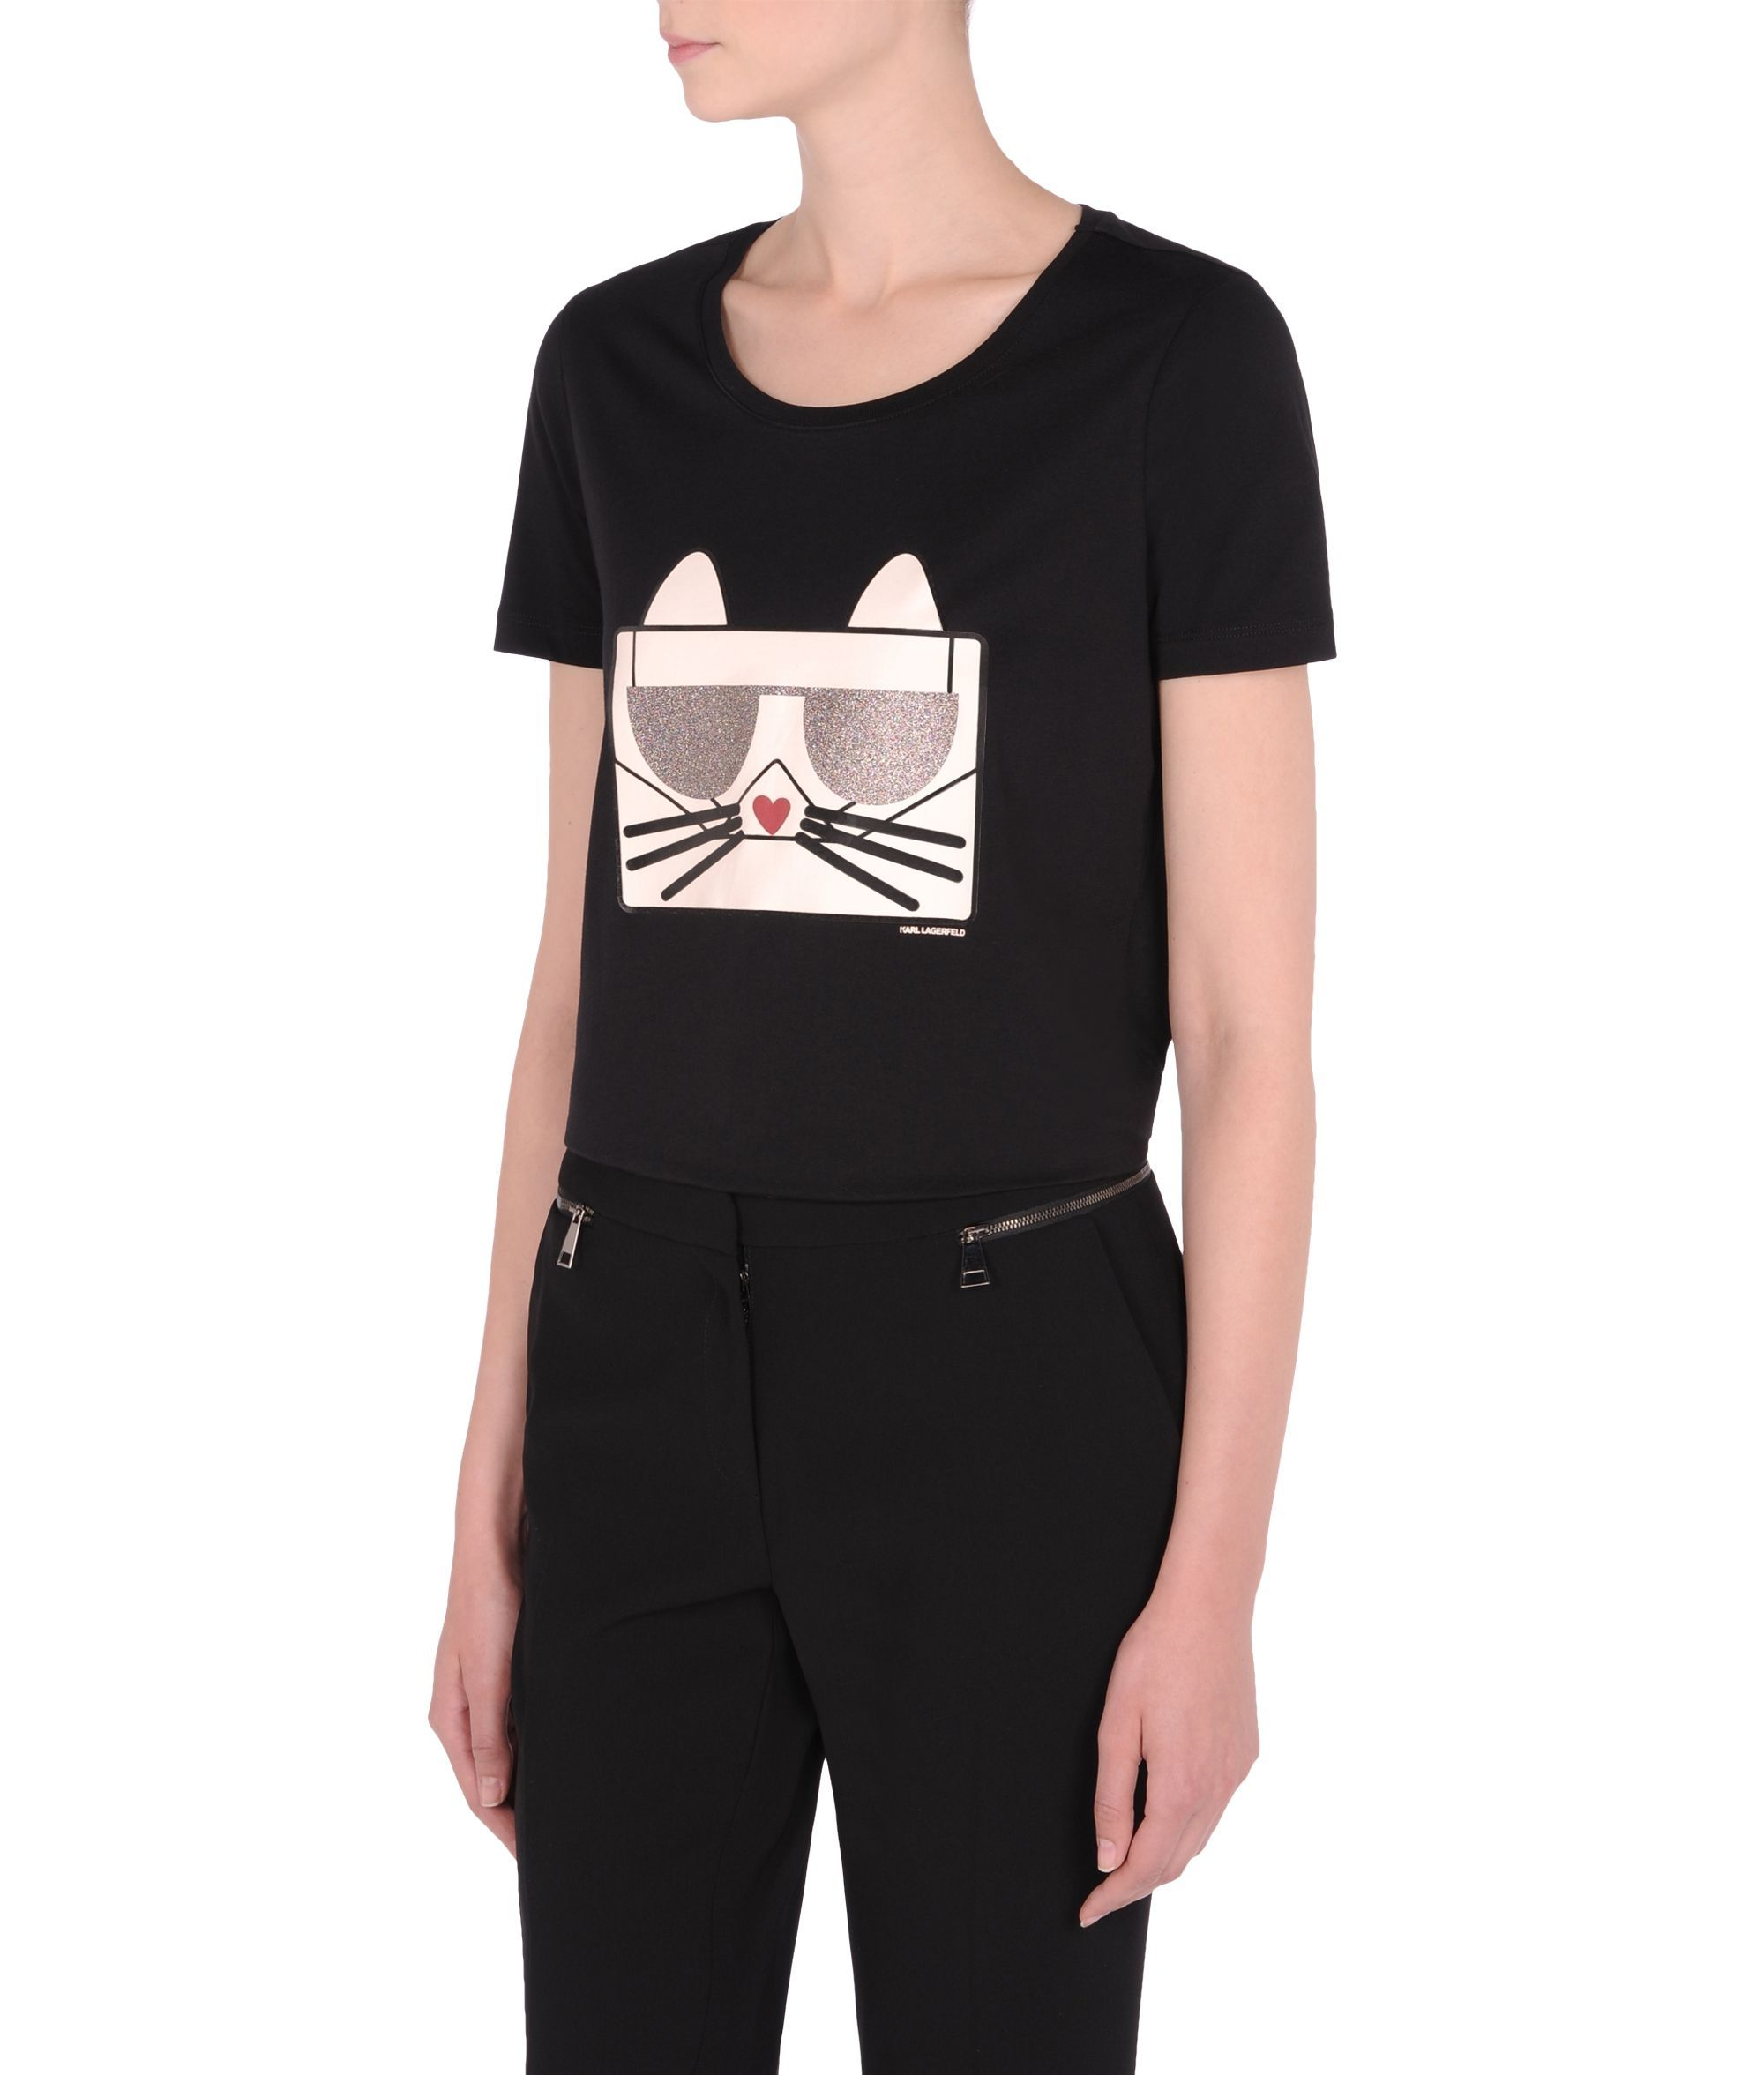 T Shirt Kocktail Choupette - Karl Lagerfeld